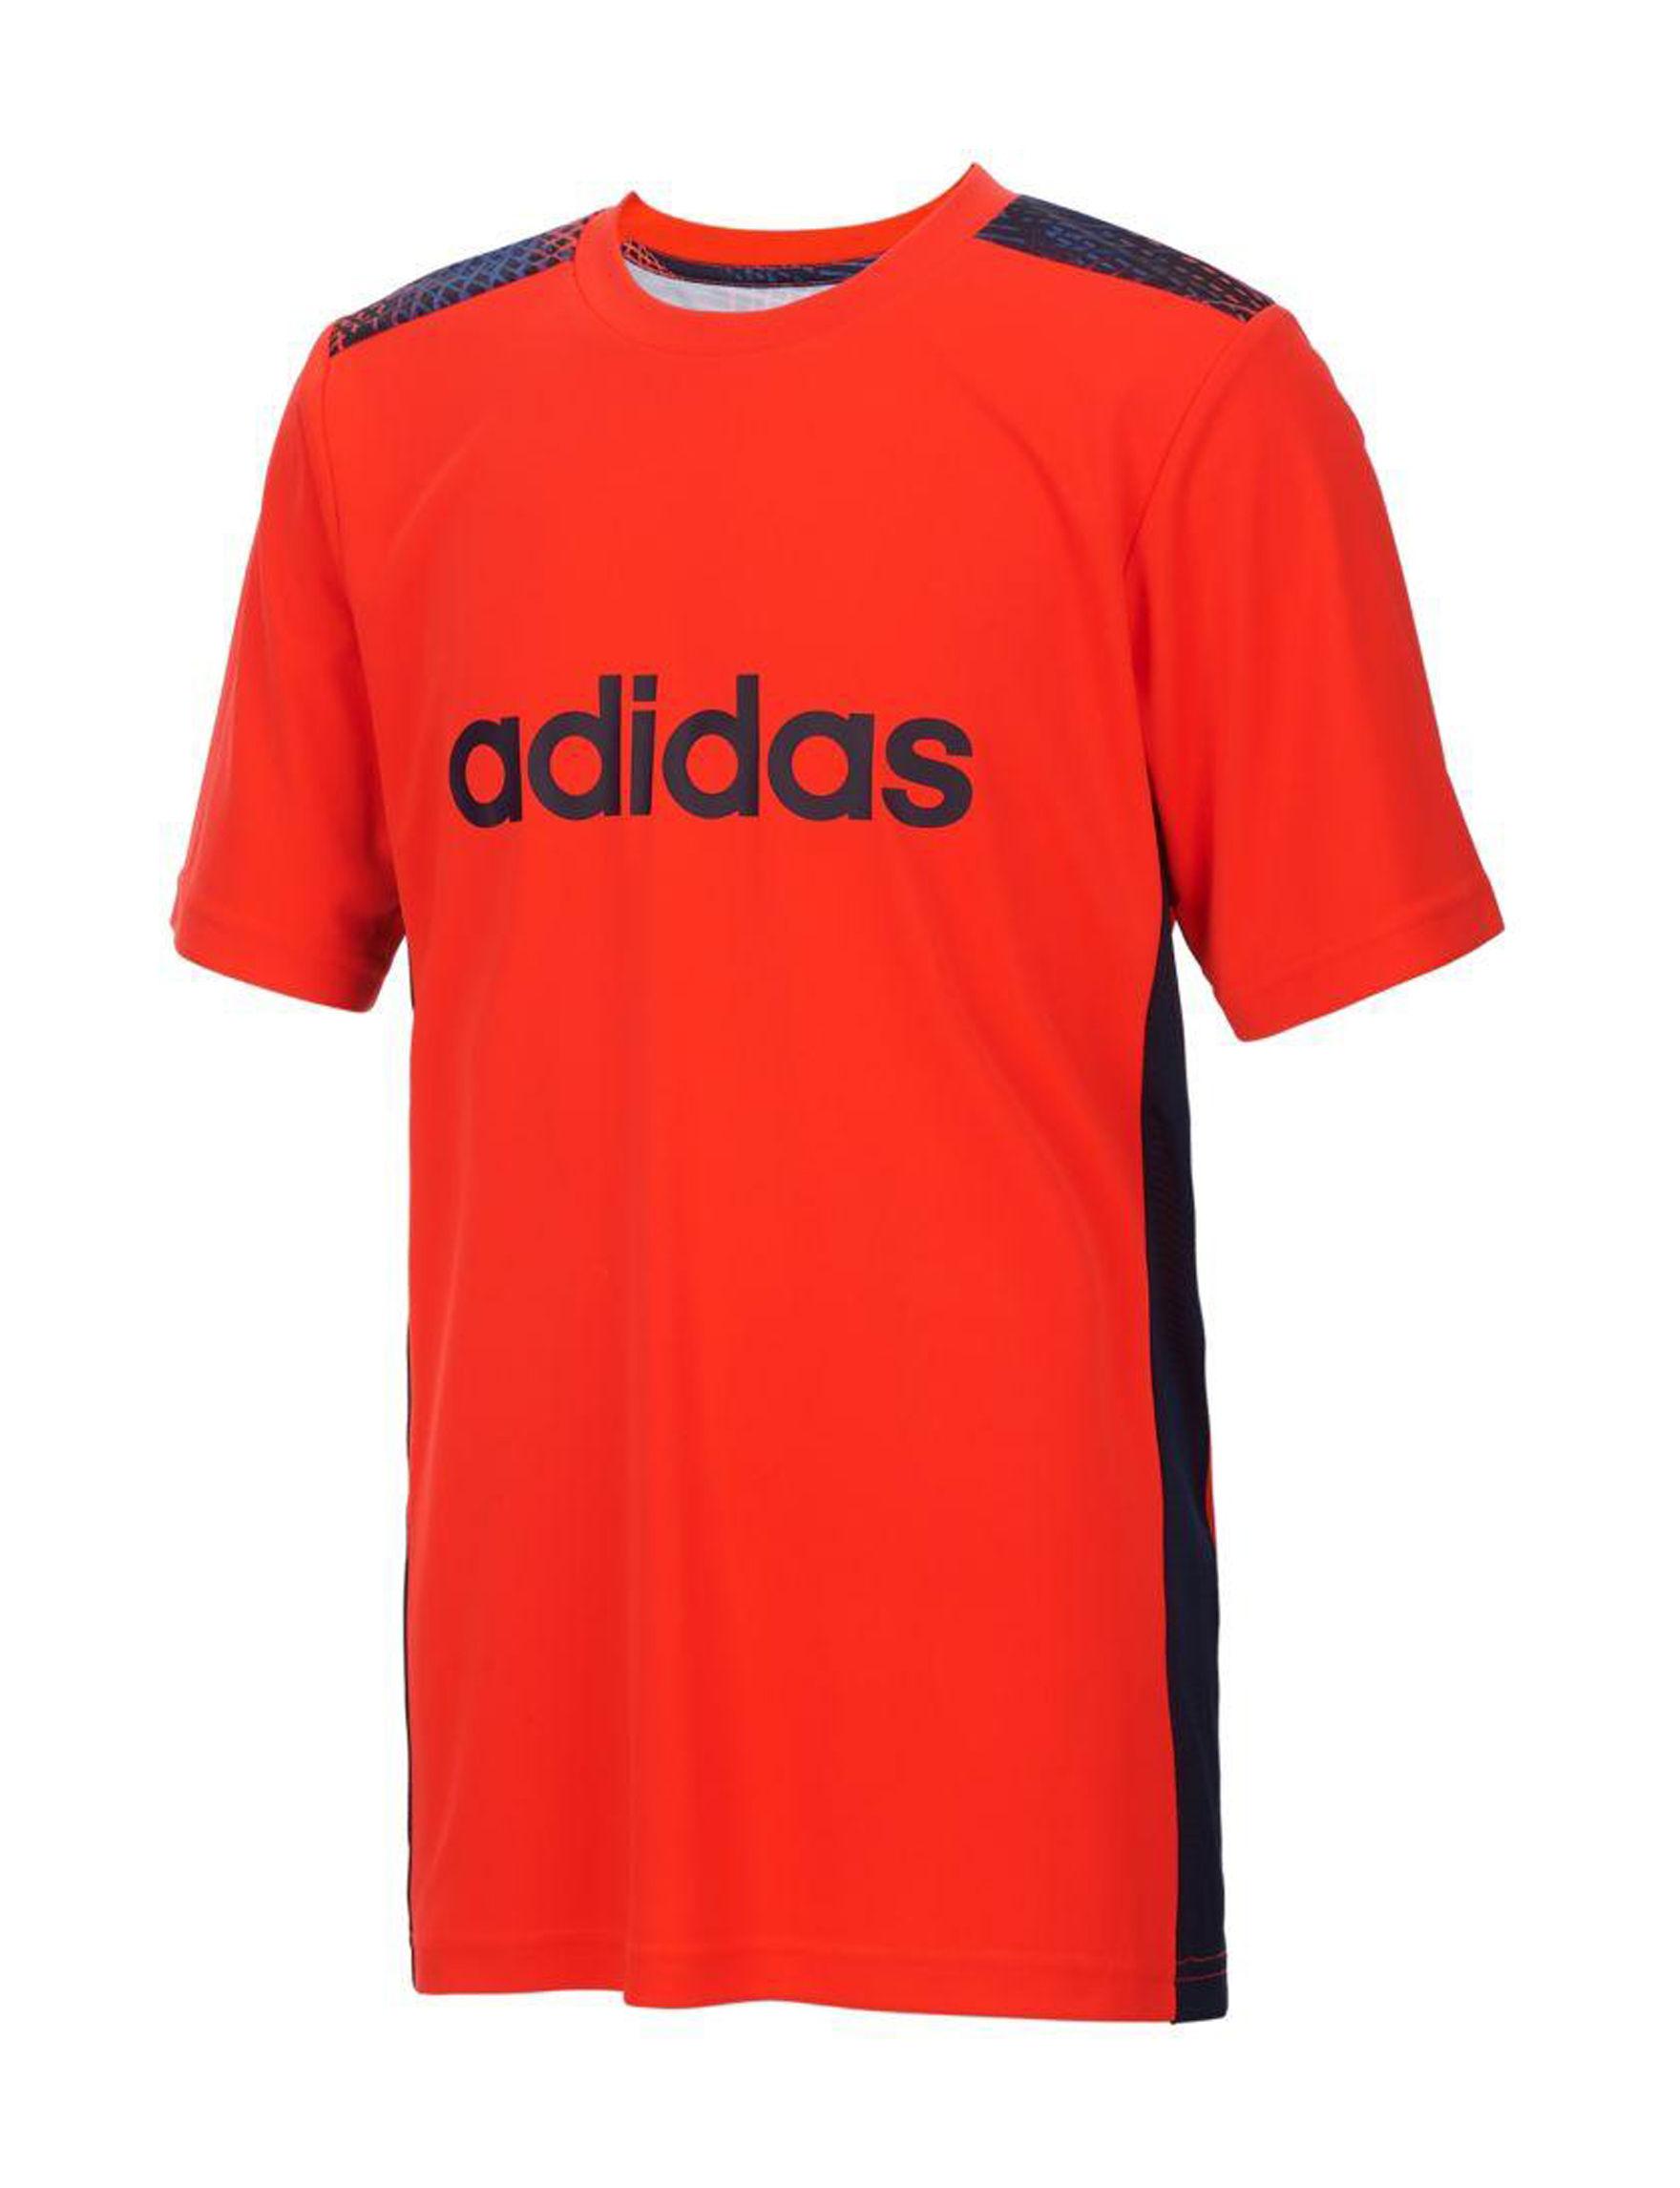 Adidas Solar Red Tees & Tanks